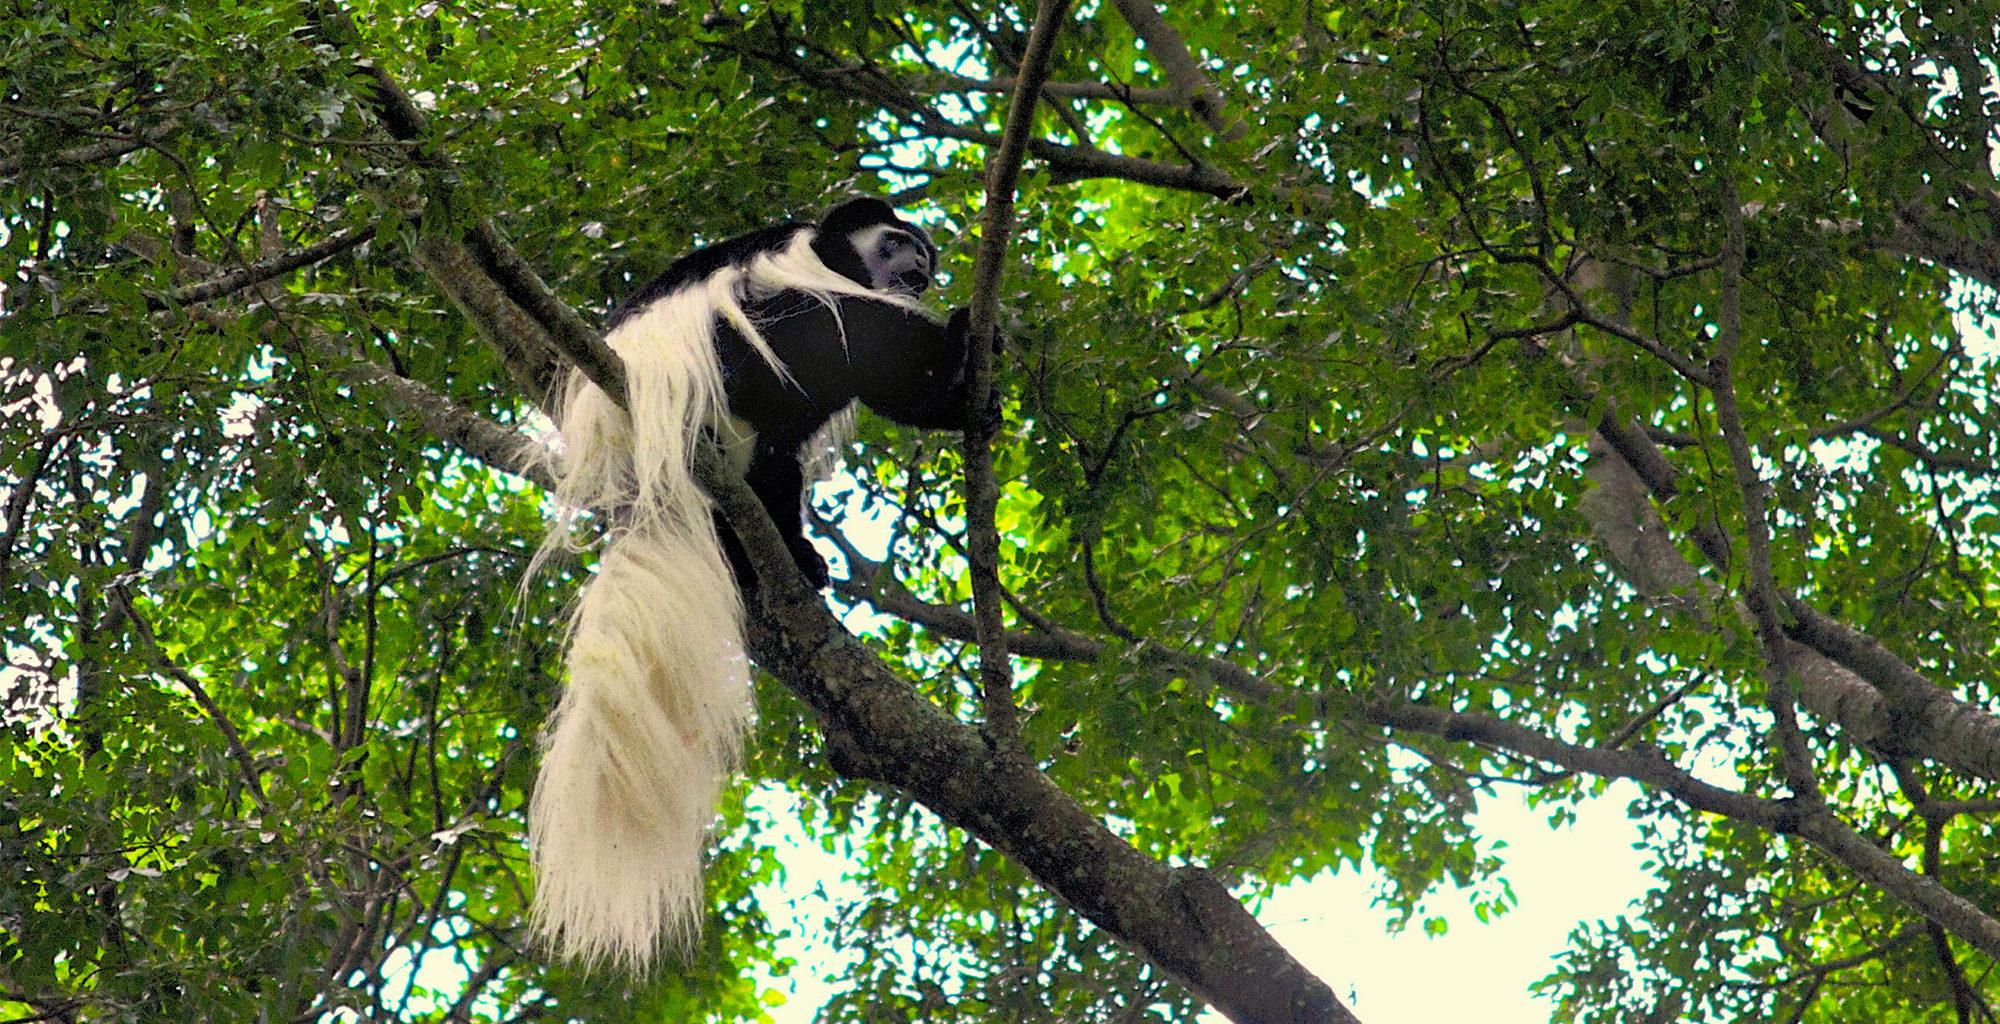 Tanzania-Rubondo-Island-Colobus-Monkey